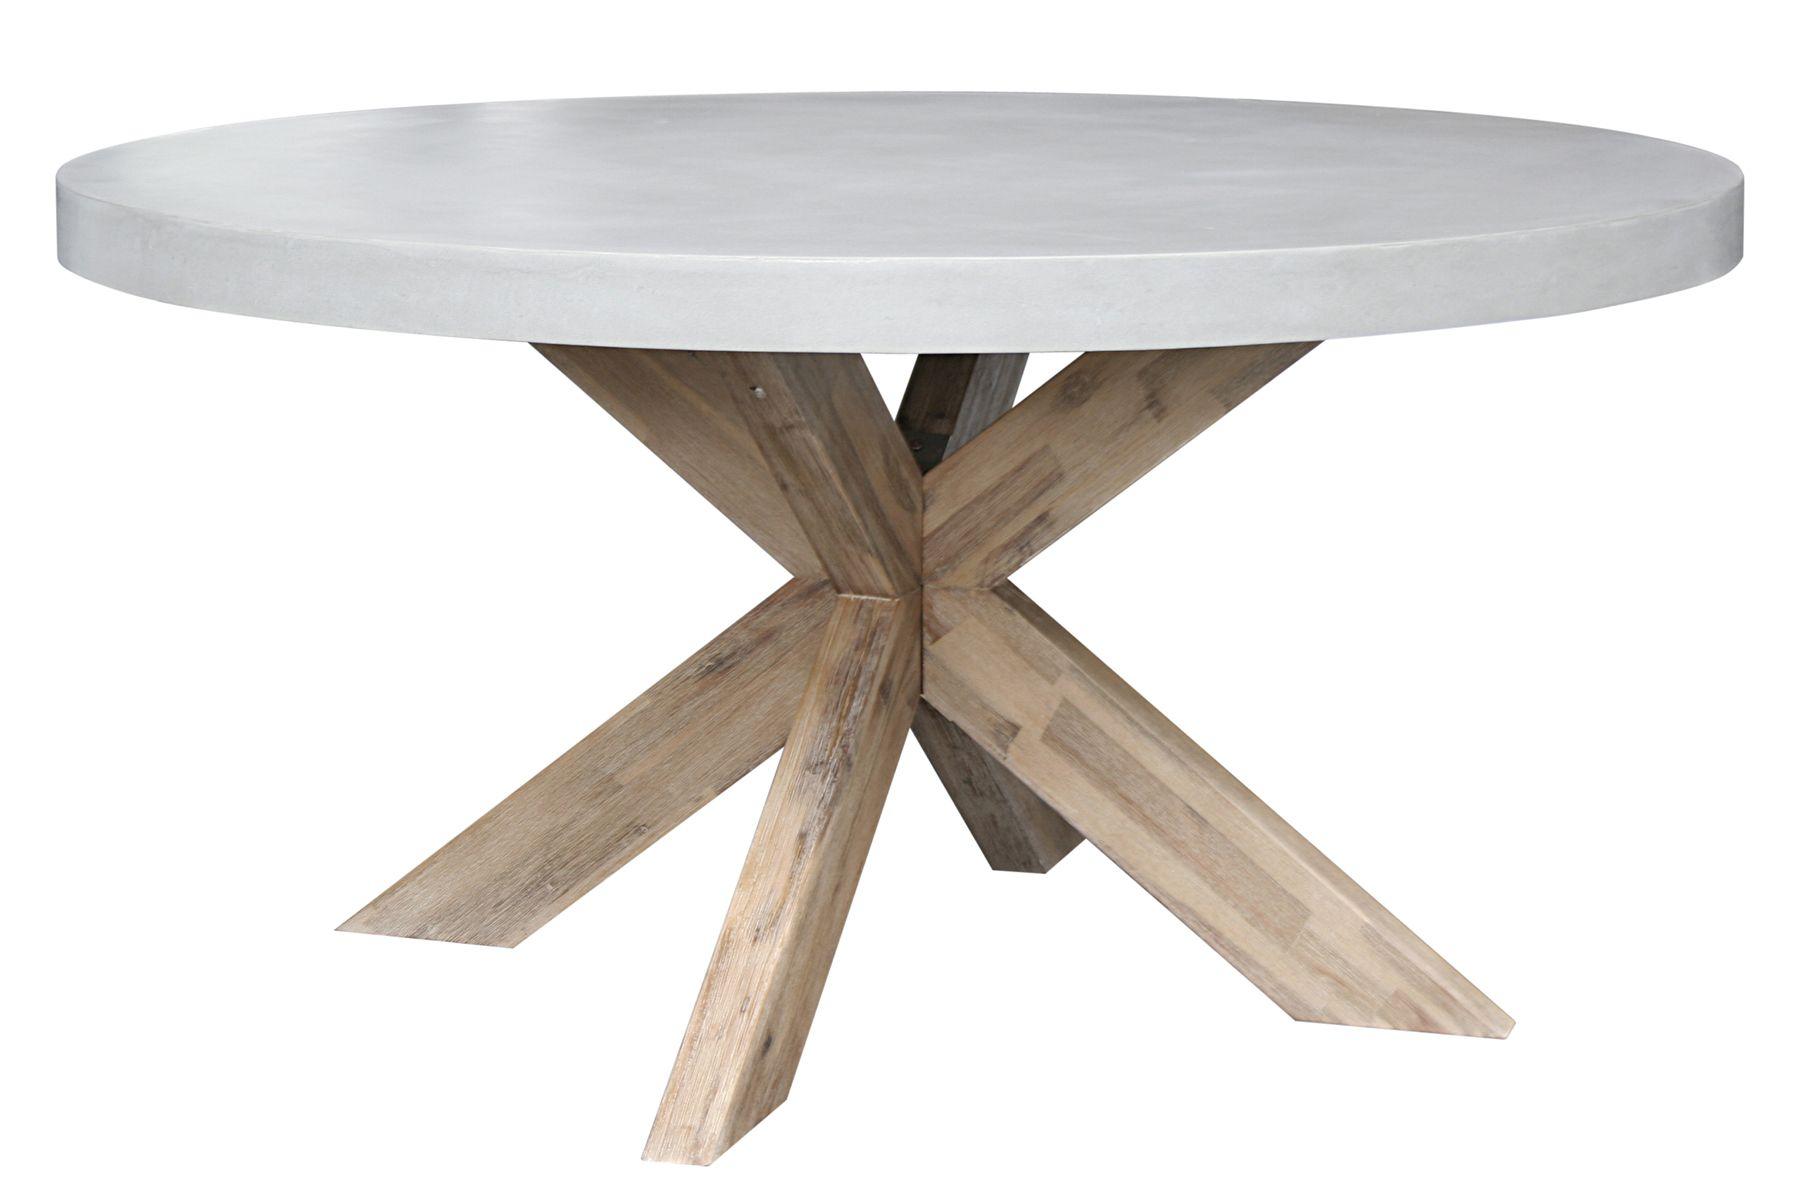 ronde witte houten tuintafel van robuust hout ook leuk. Black Bedroom Furniture Sets. Home Design Ideas